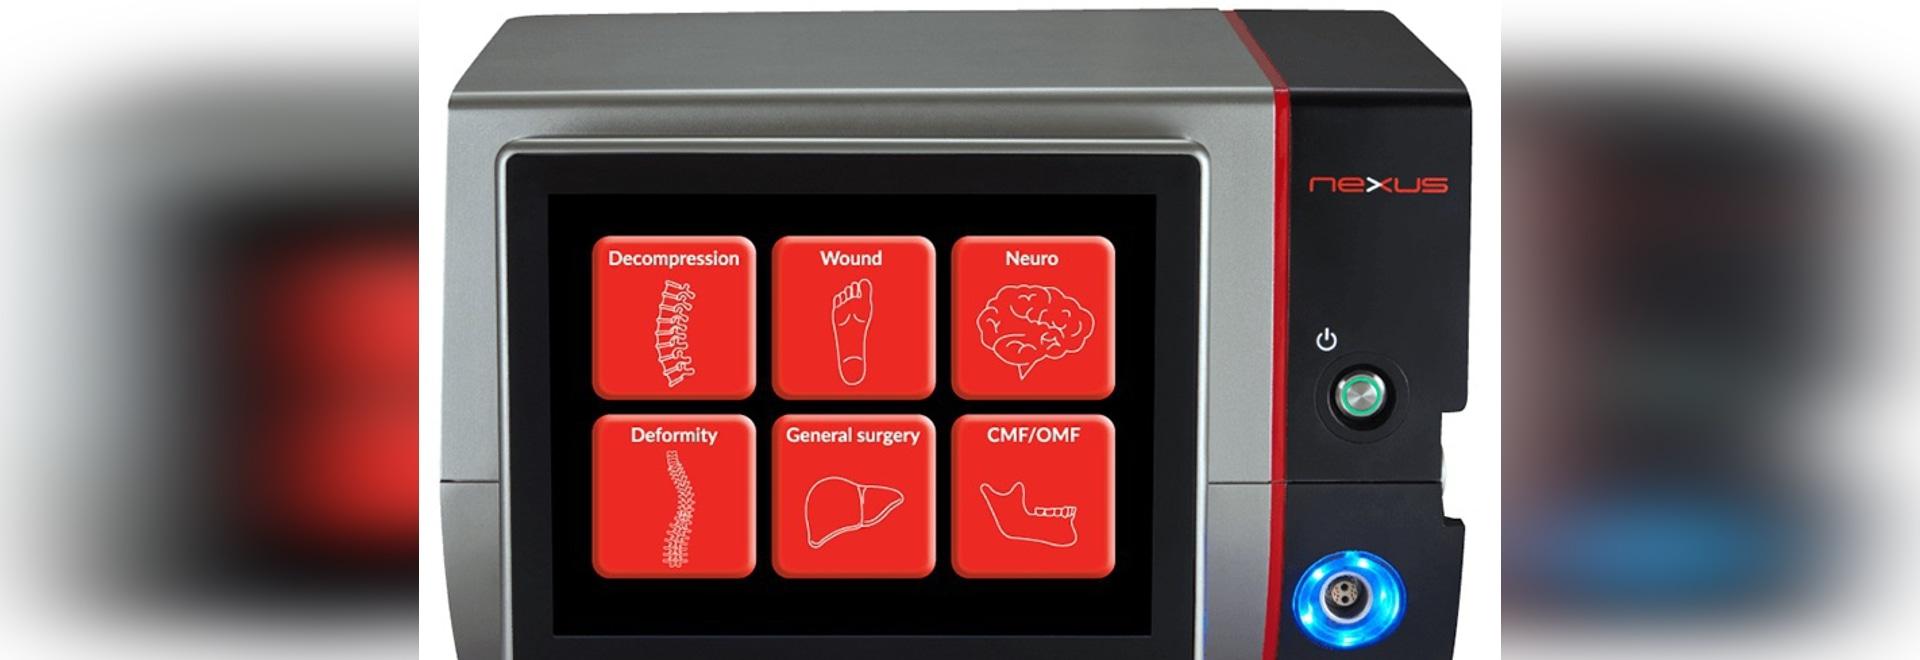 Nexus Ultrasonic Surgical Platform from Misonix FDA Cleared